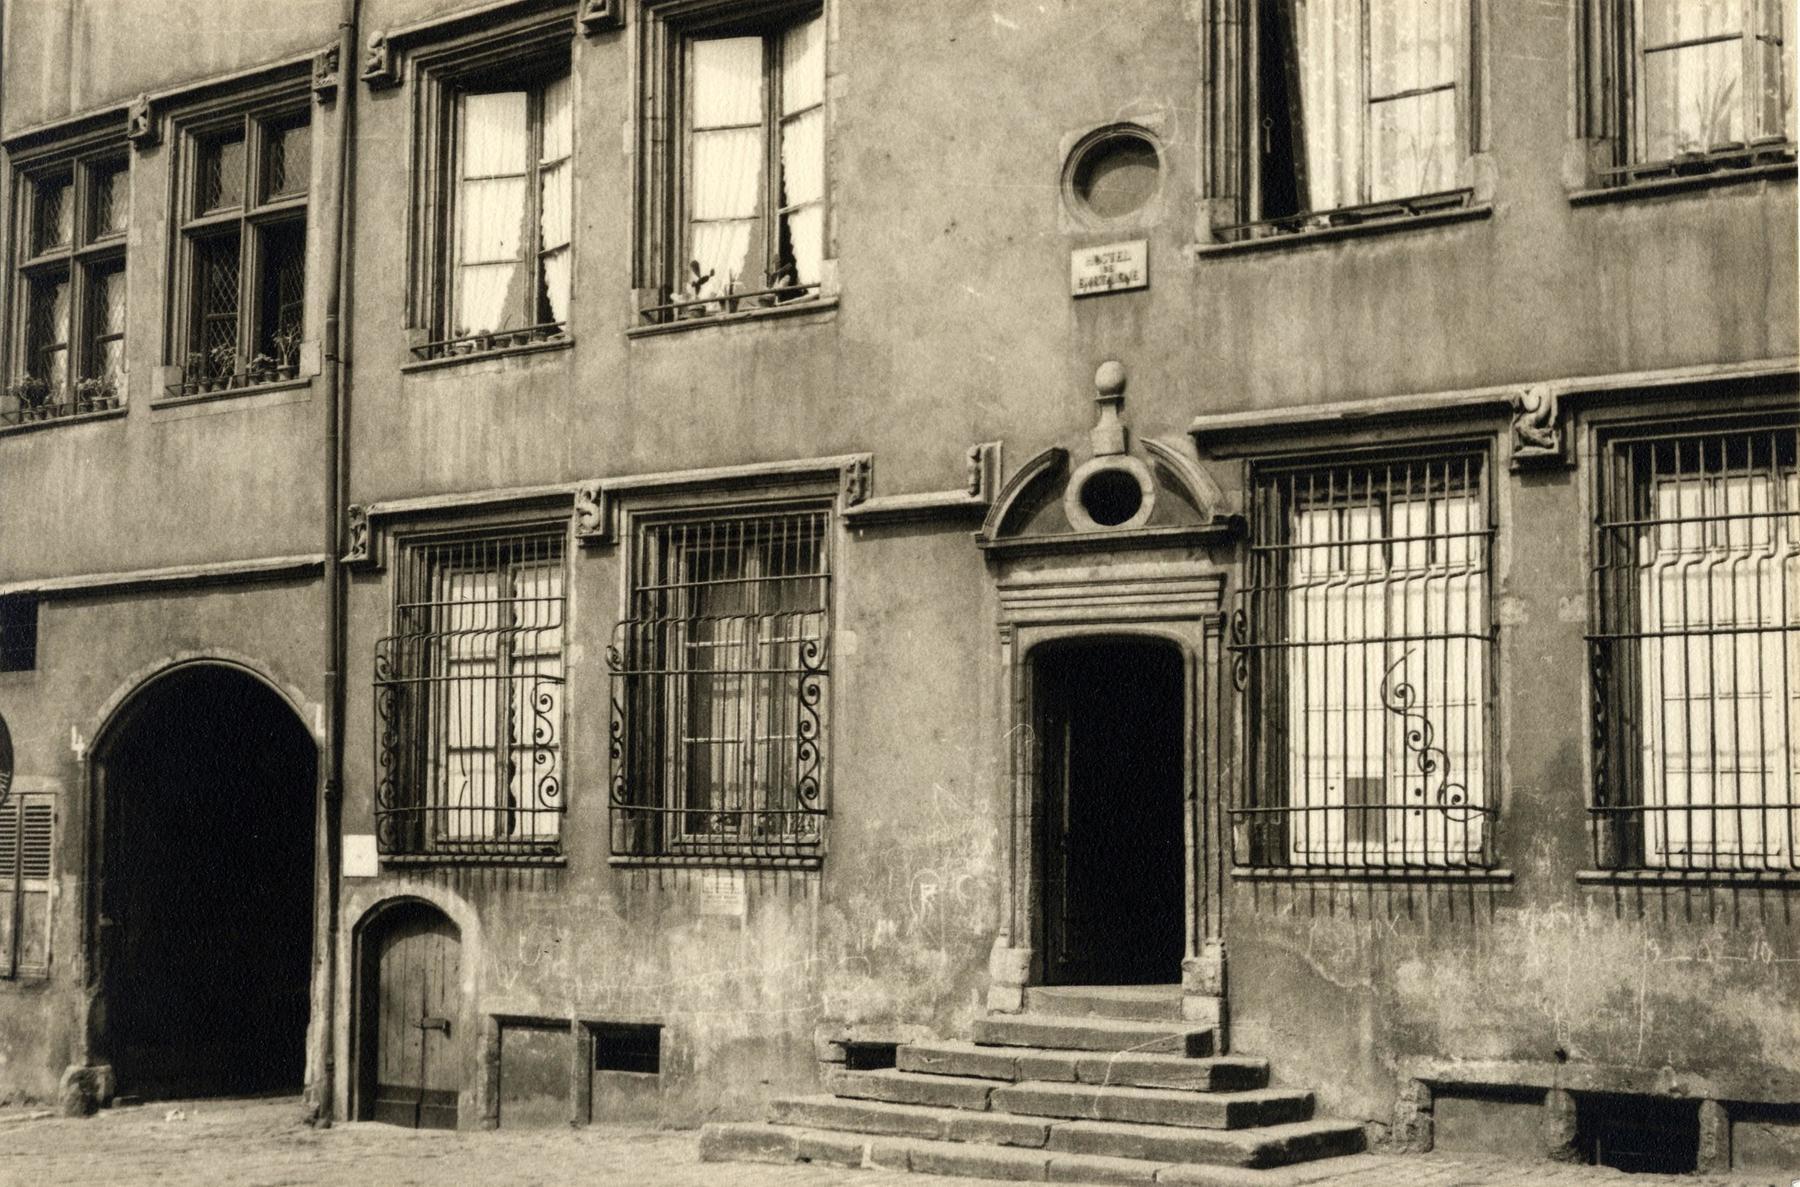 Contenu du Hôtel de Burtaigne